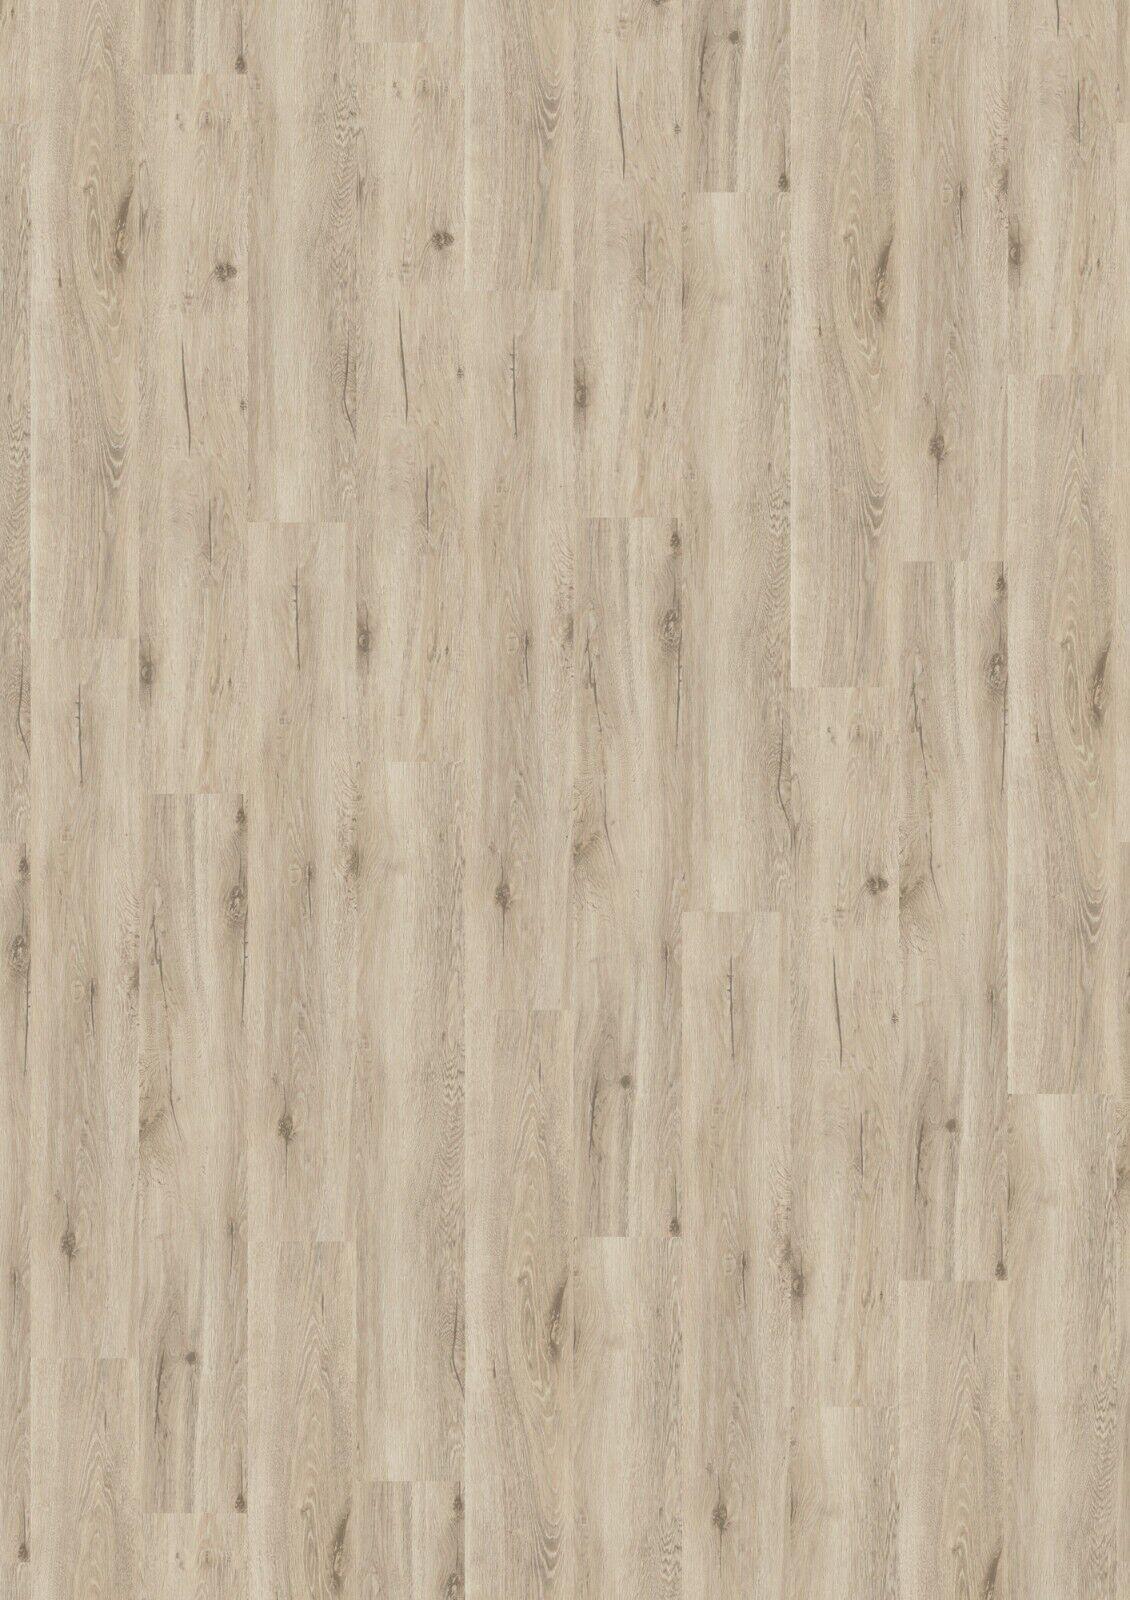 Objectflor Vinyl Designbelag Expona Living+ 8002 Nordic Wood 3,37 m² Paket